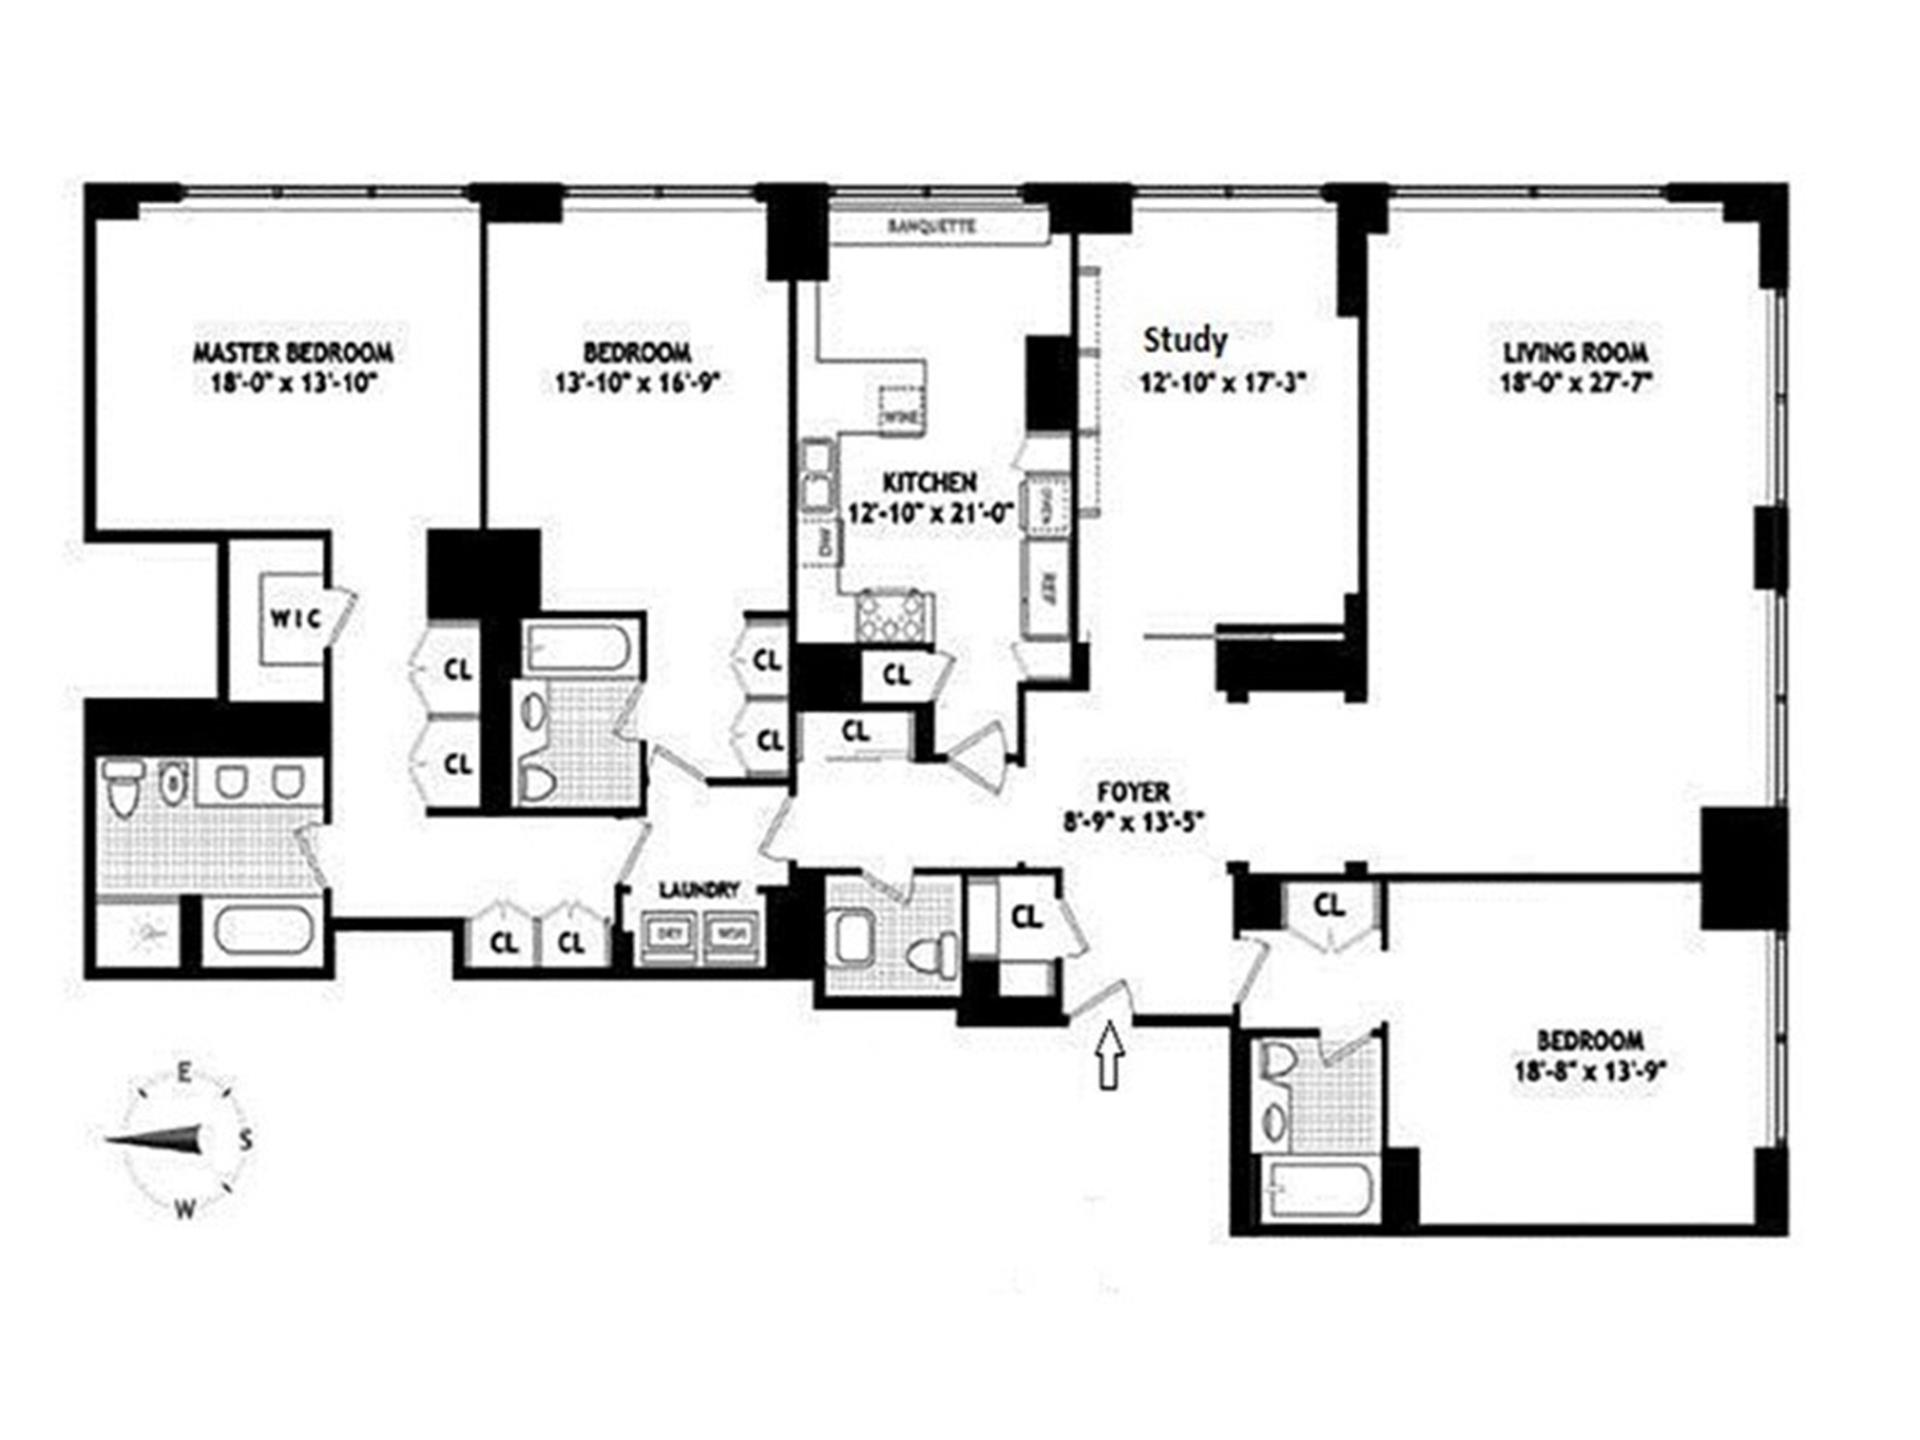 Floor plan of 845 United Nations Plaza, 82B - Turtle Bay, New York